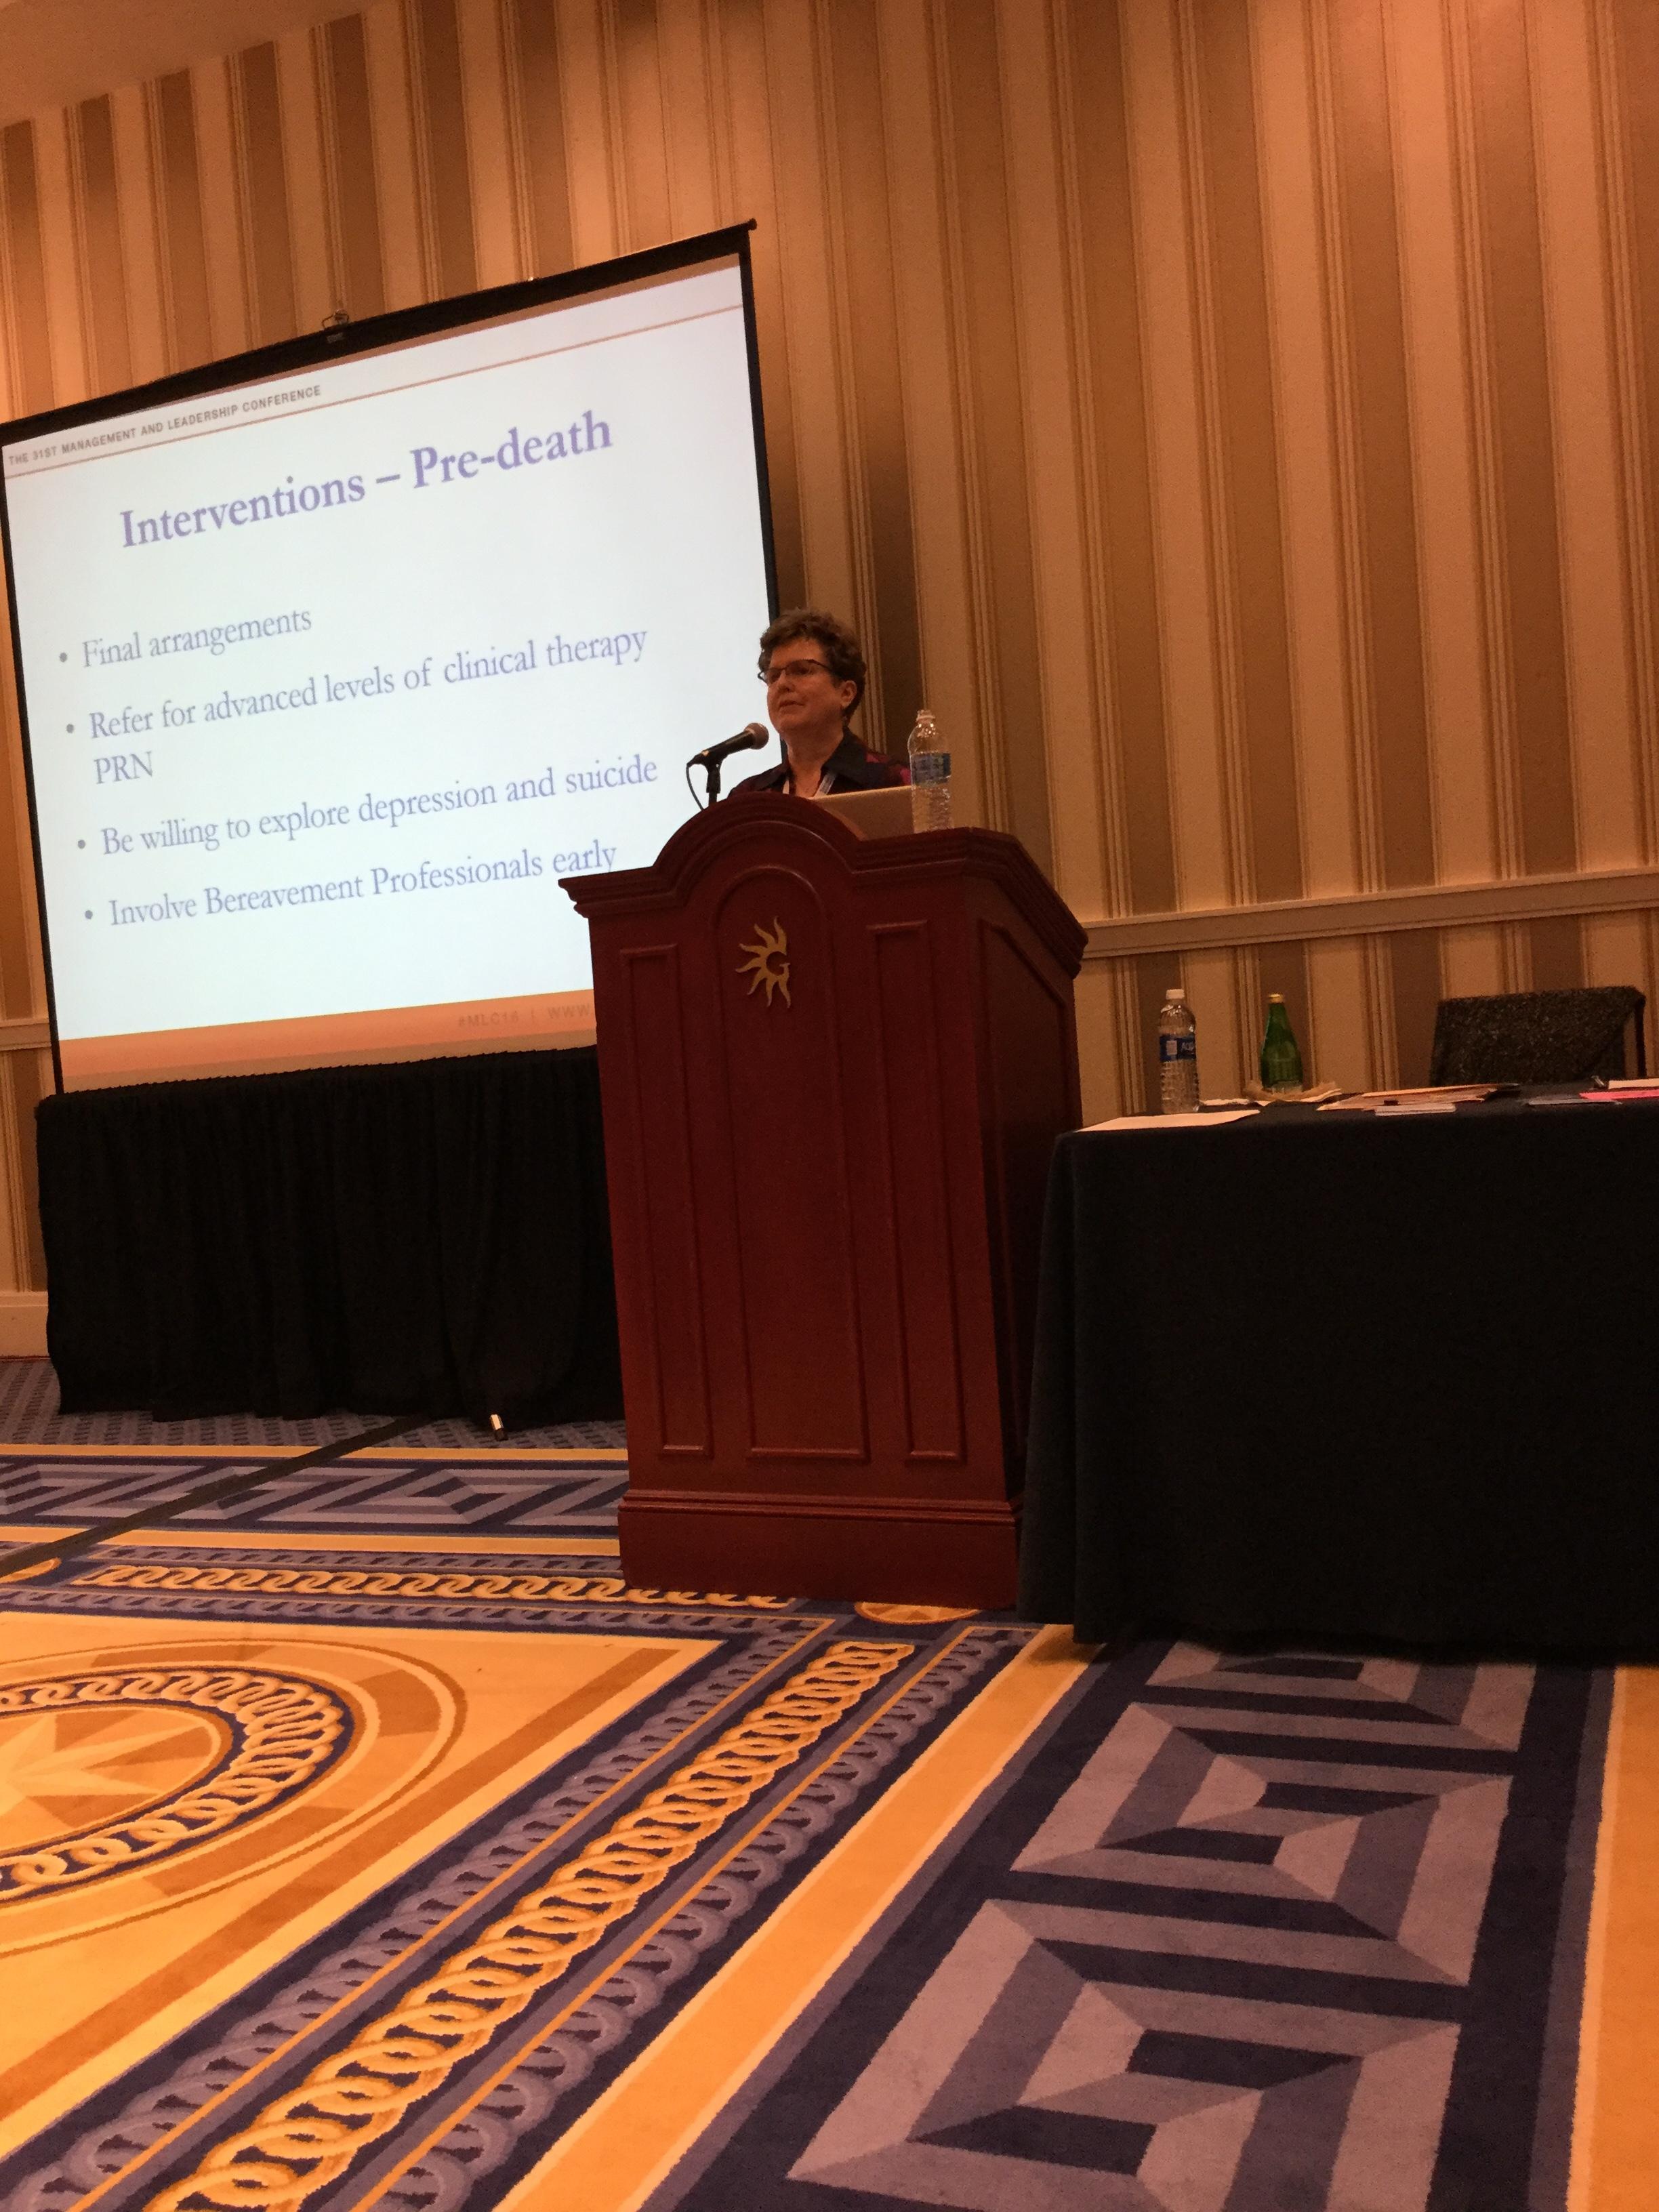 A social worker discussing pre- bereavement strategies.